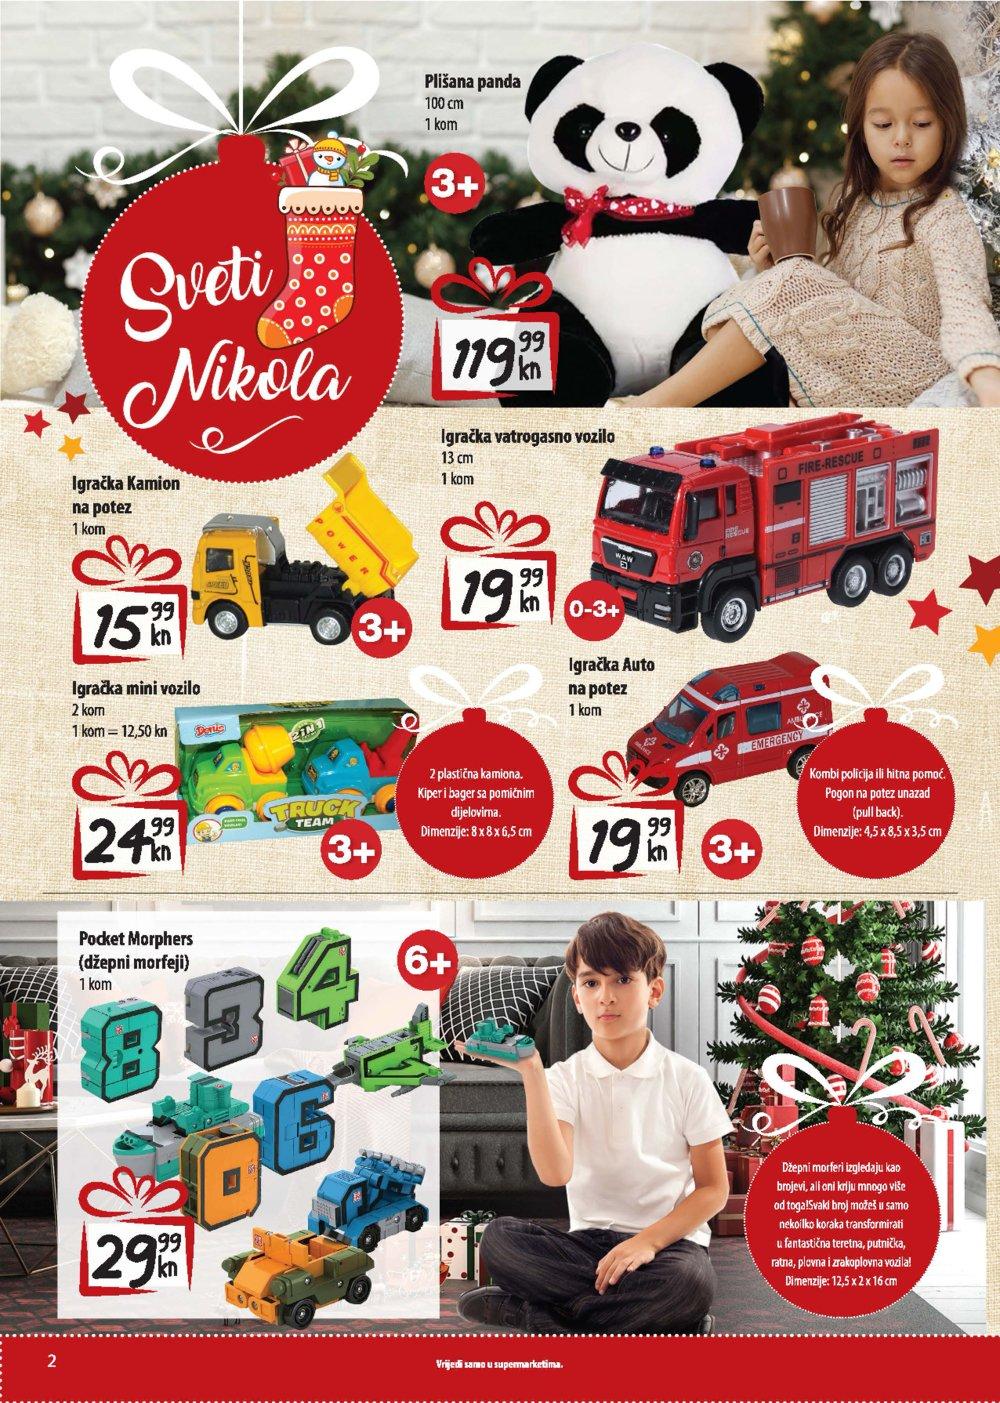 NTL katalog Sveti Nikola i Slatki Dani 28.11.-07.12.2019.